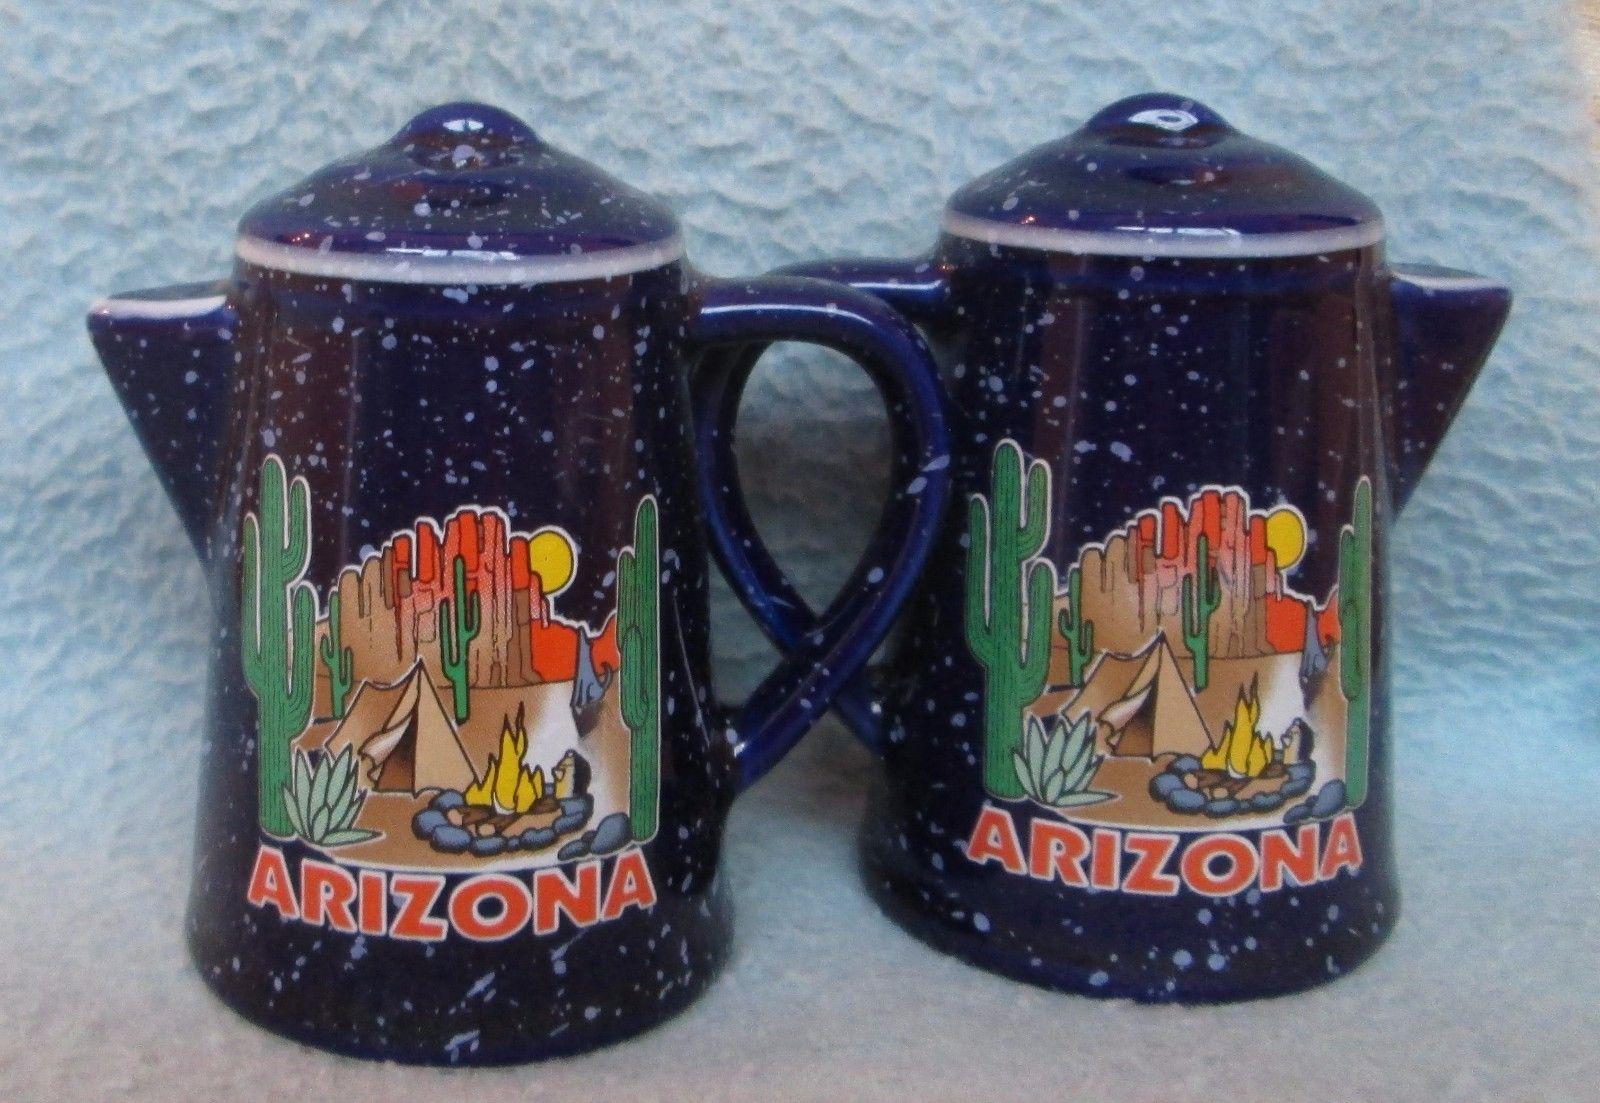 Vintage Camping Arizona Pot Souvenir Salt & Pepper Shakers